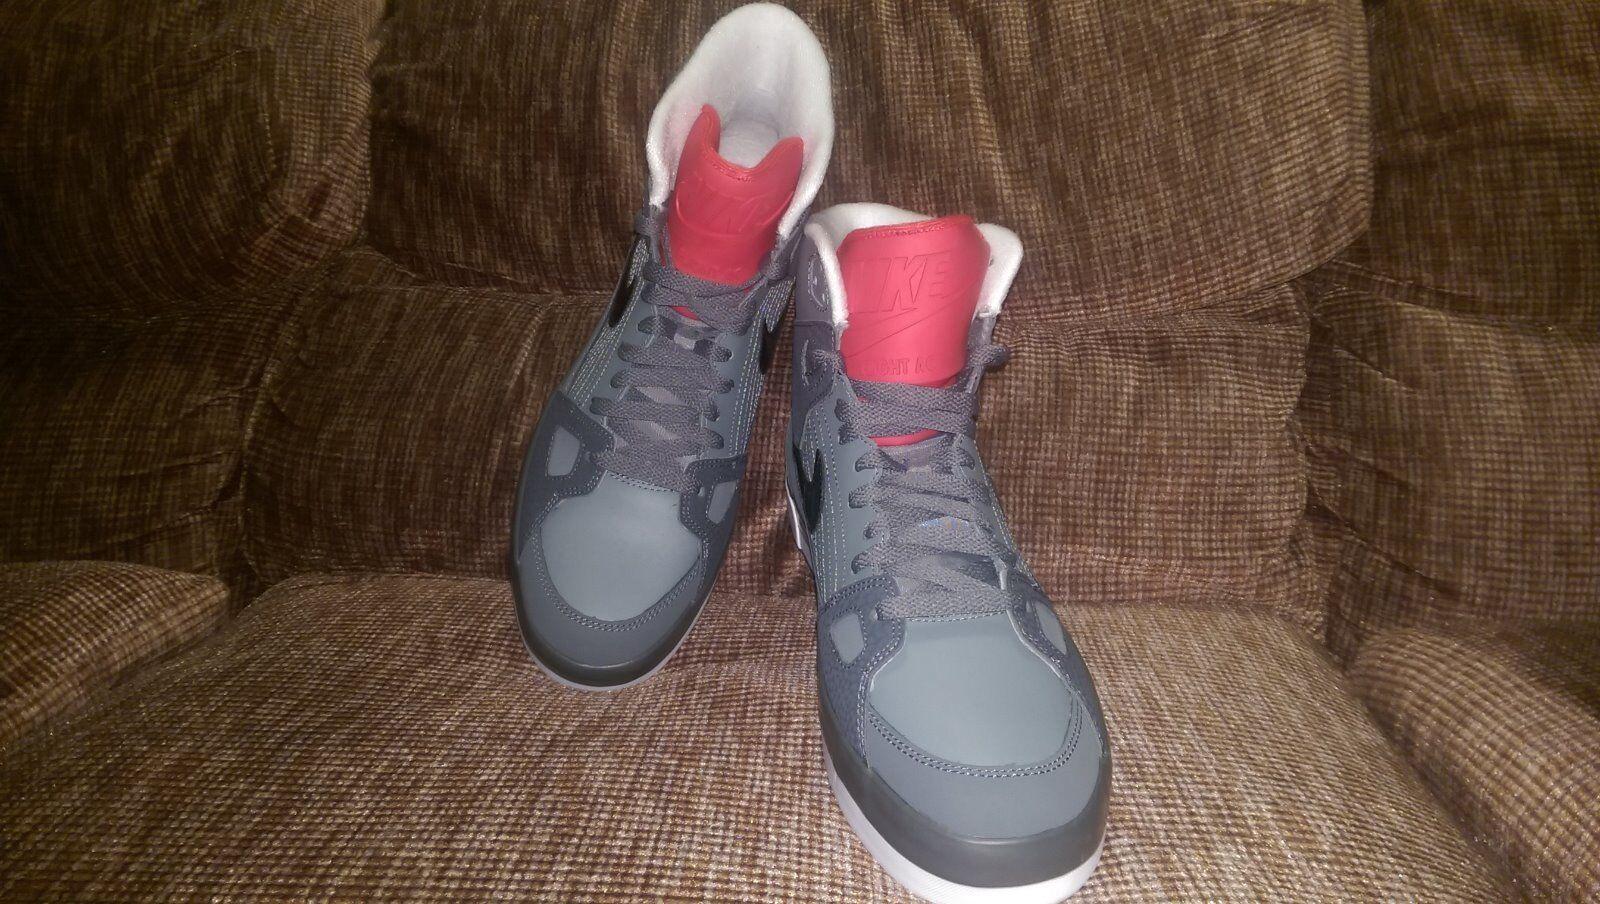 Men's Nike Air Flight AC Red Grey White Sz 10.5 High-Top Sneakers 577128-003